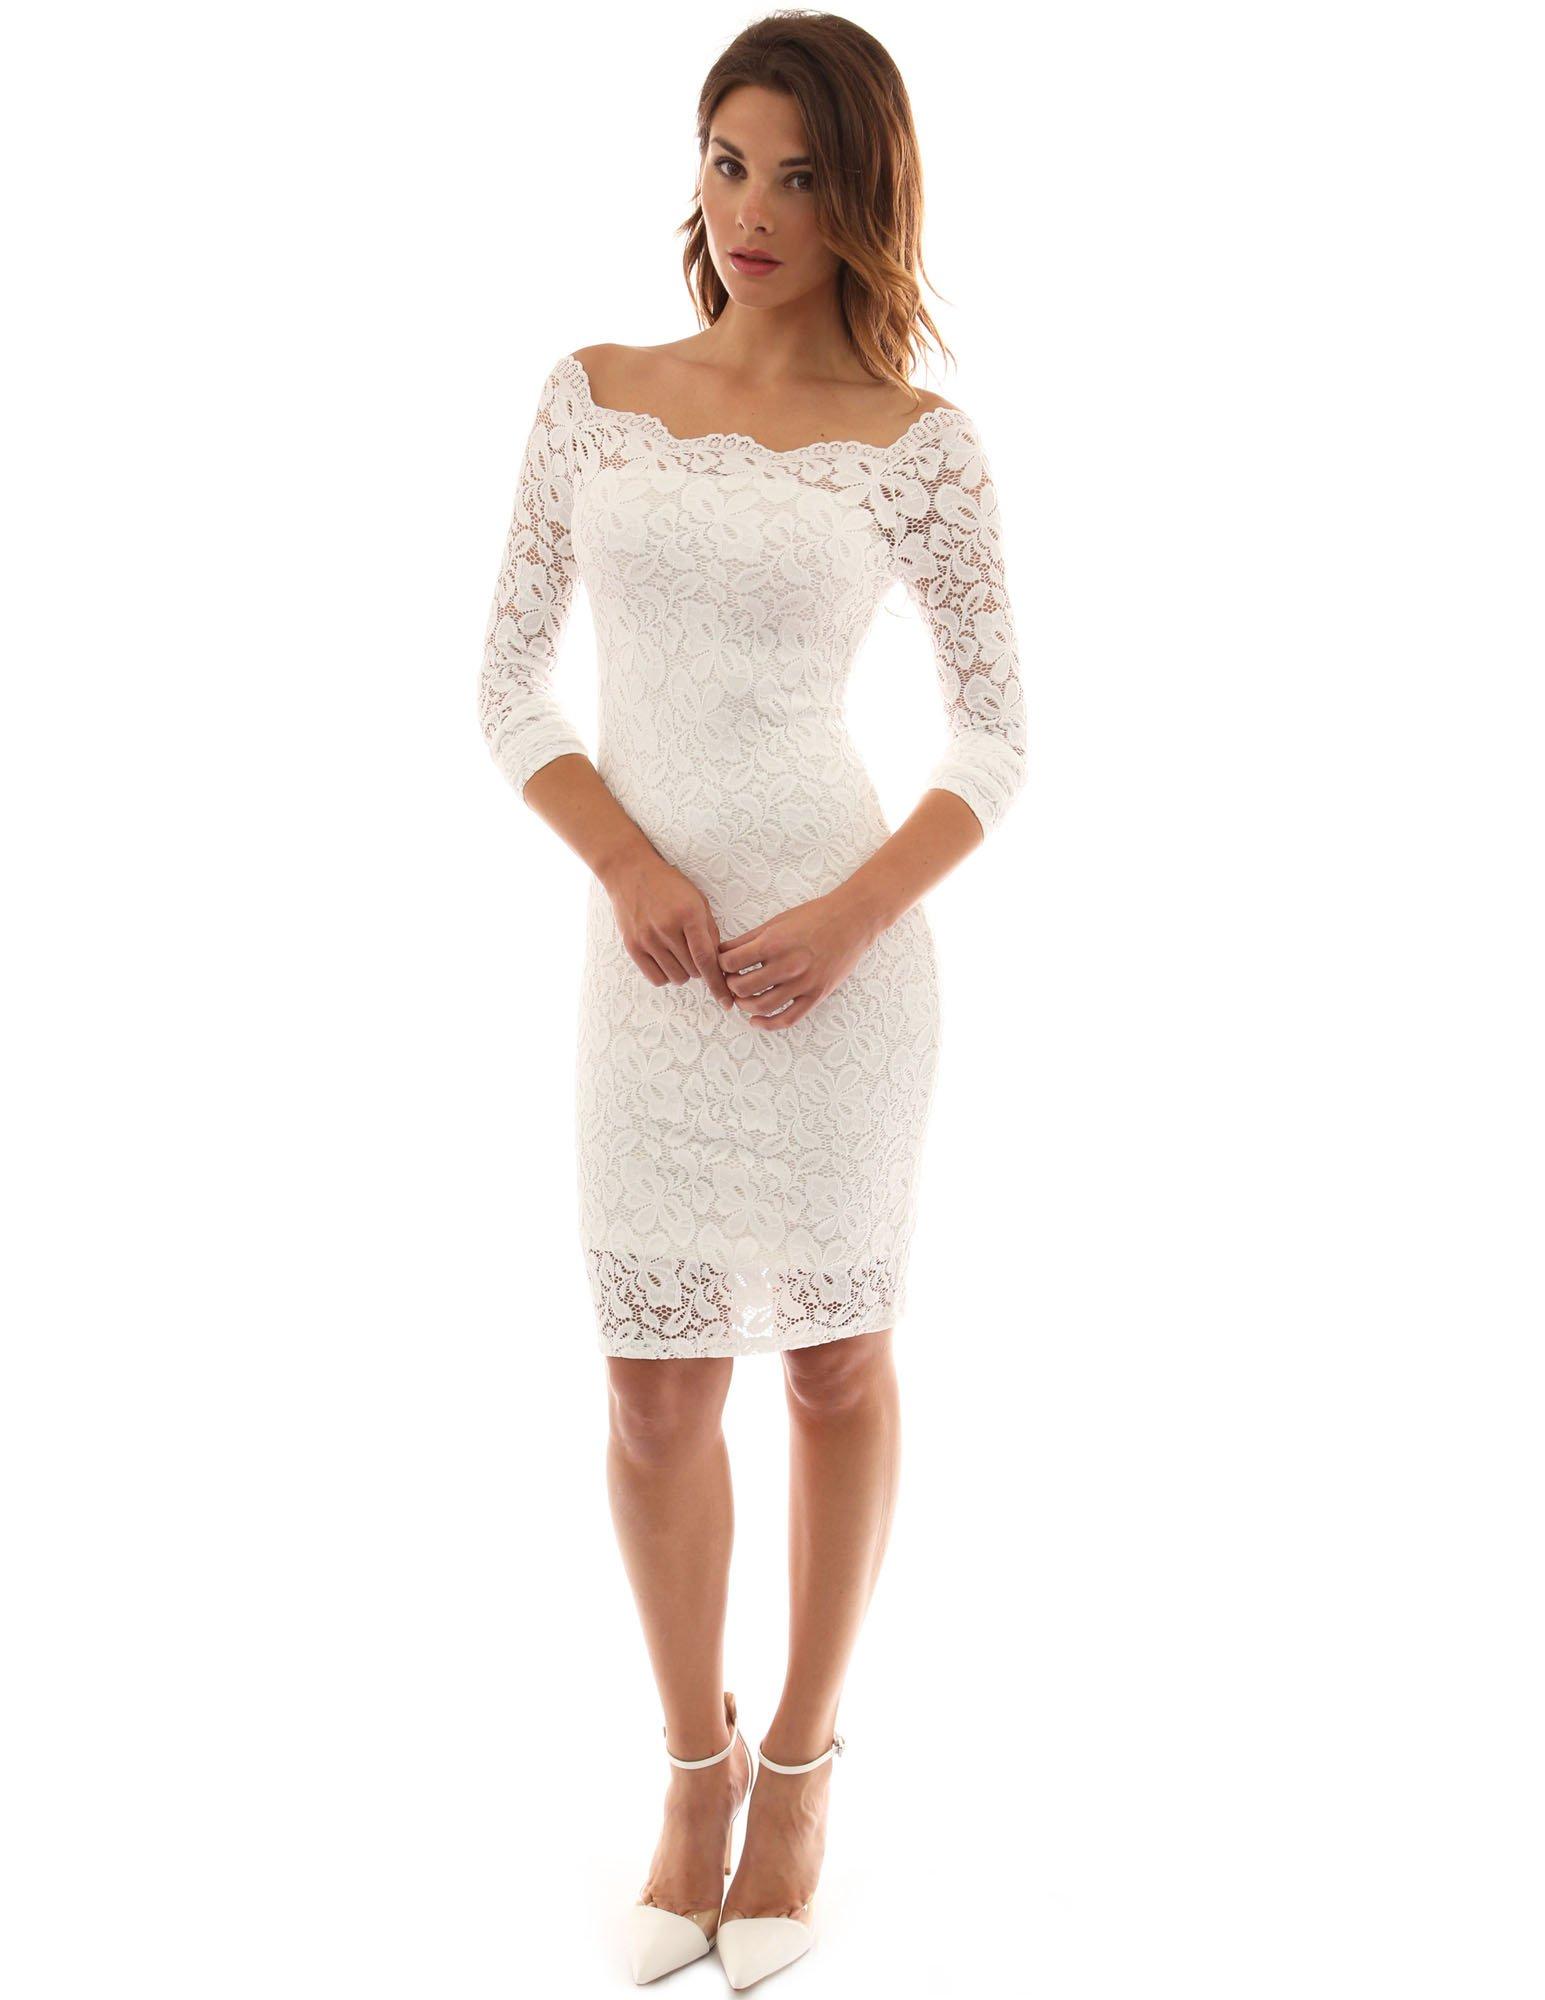 PattyBoutik Women Off Shoulder Floral Lace Twin Set Dress (Off-White Medium) by PattyBoutik